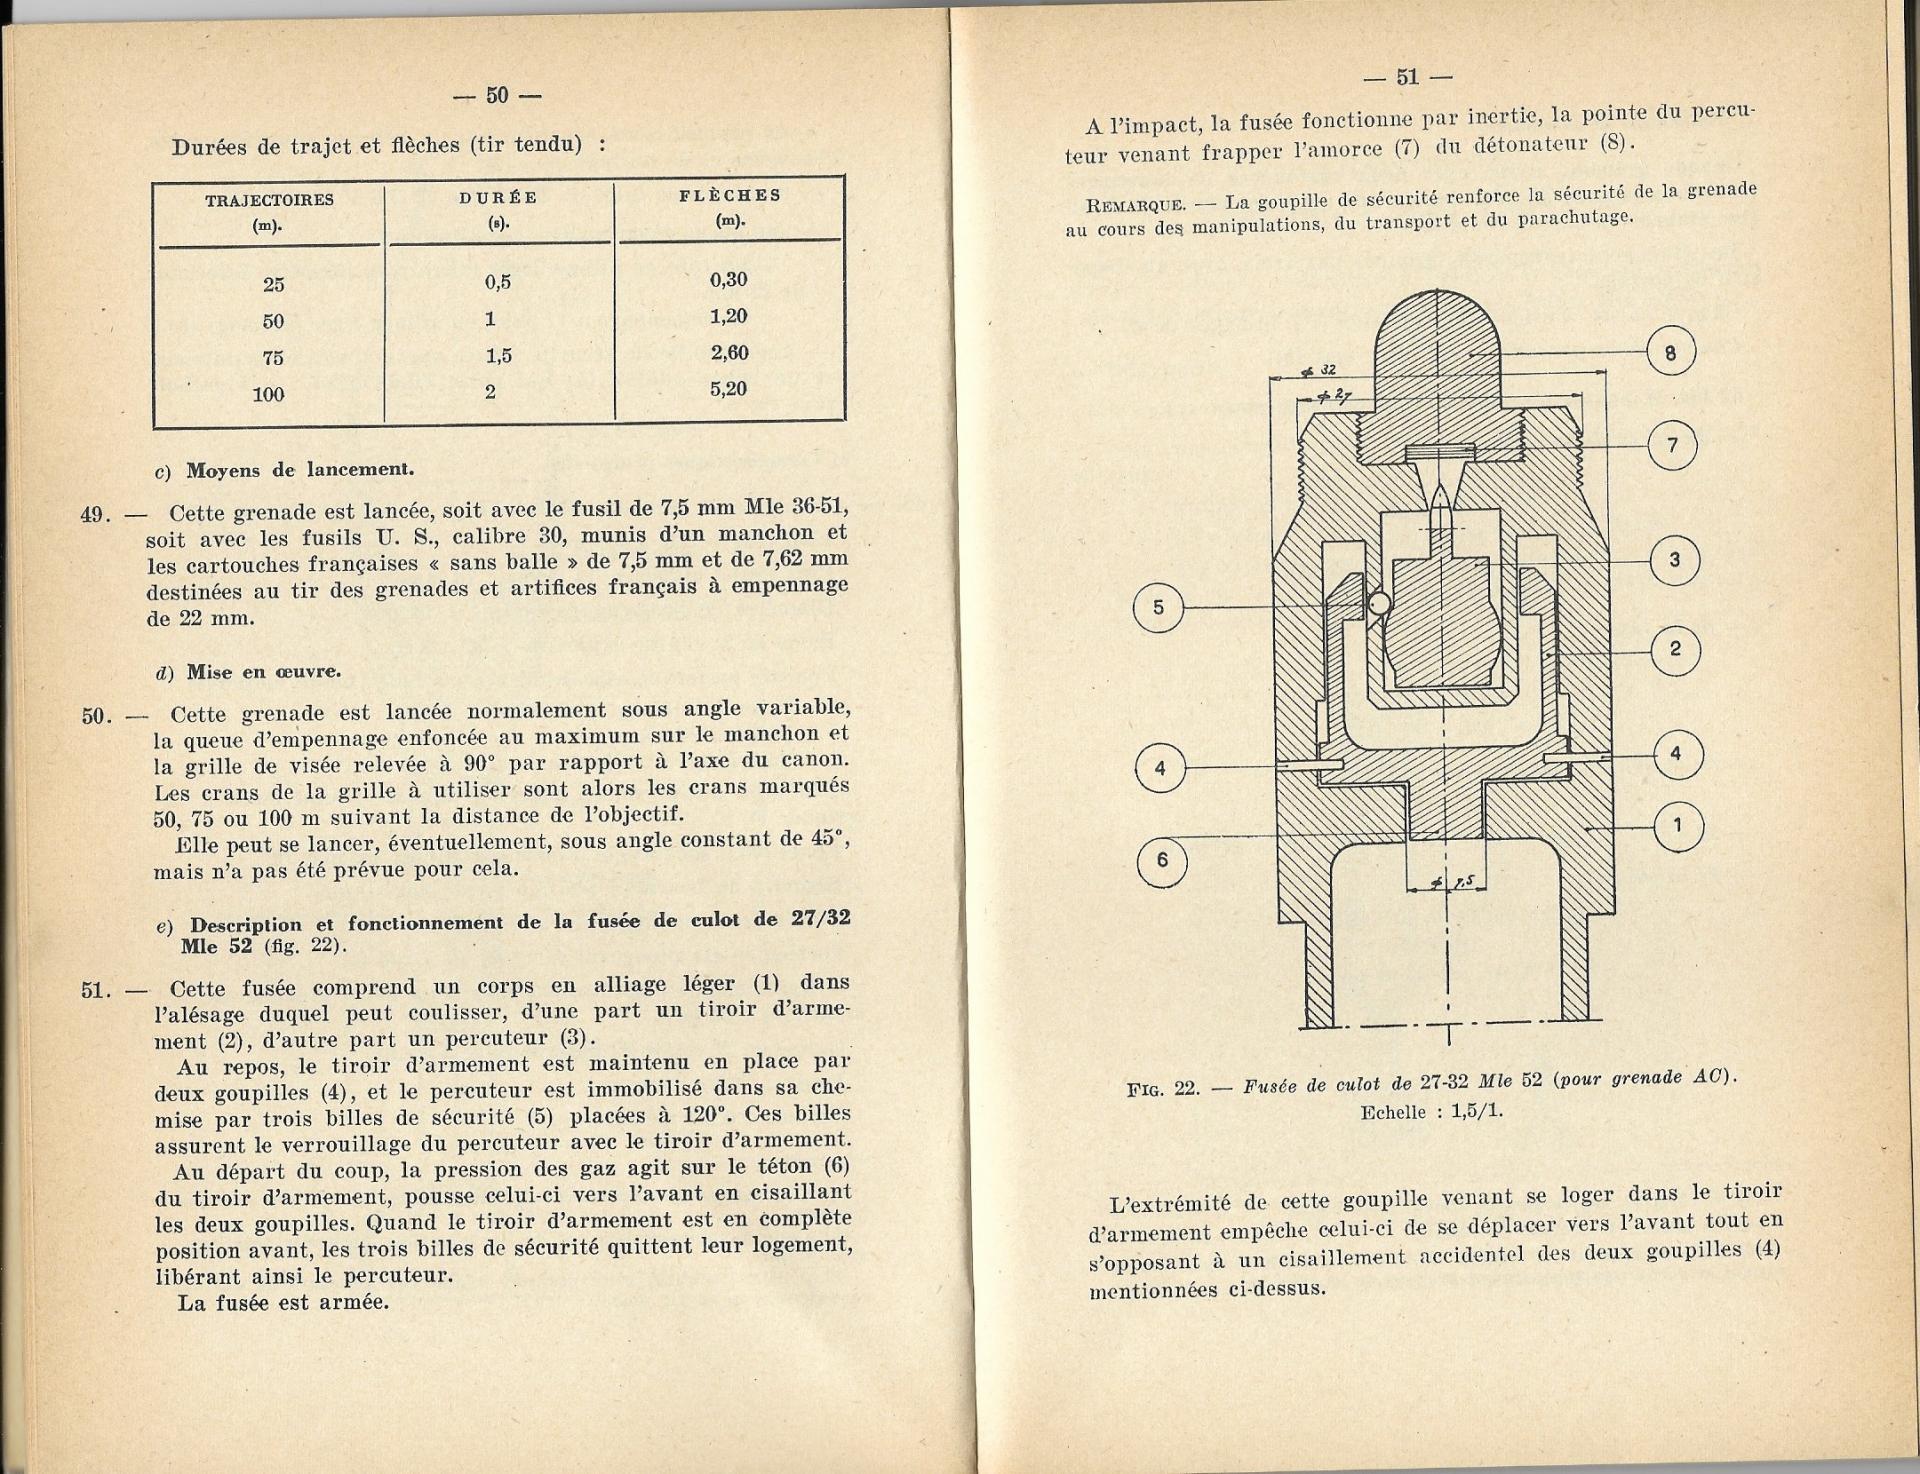 Grenades a fusil 1957 p50 51